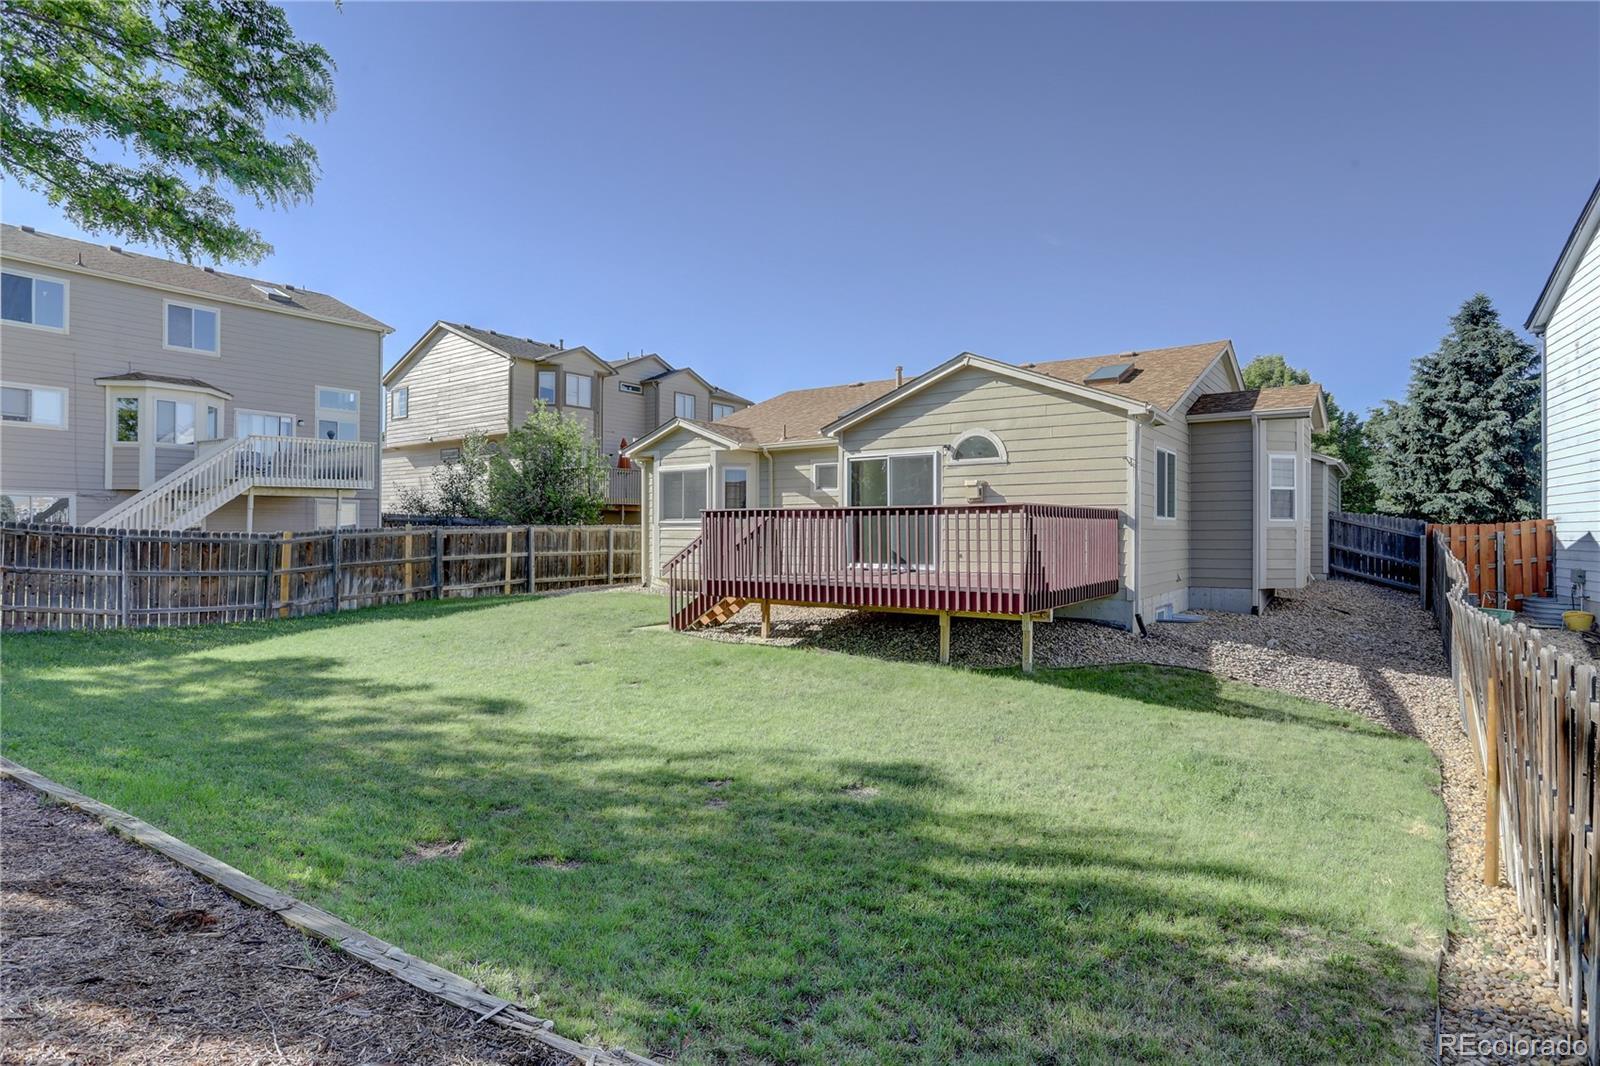 MLS# 2536639 - 25 - 18585 E Greenwood Place, Aurora, CO 80013